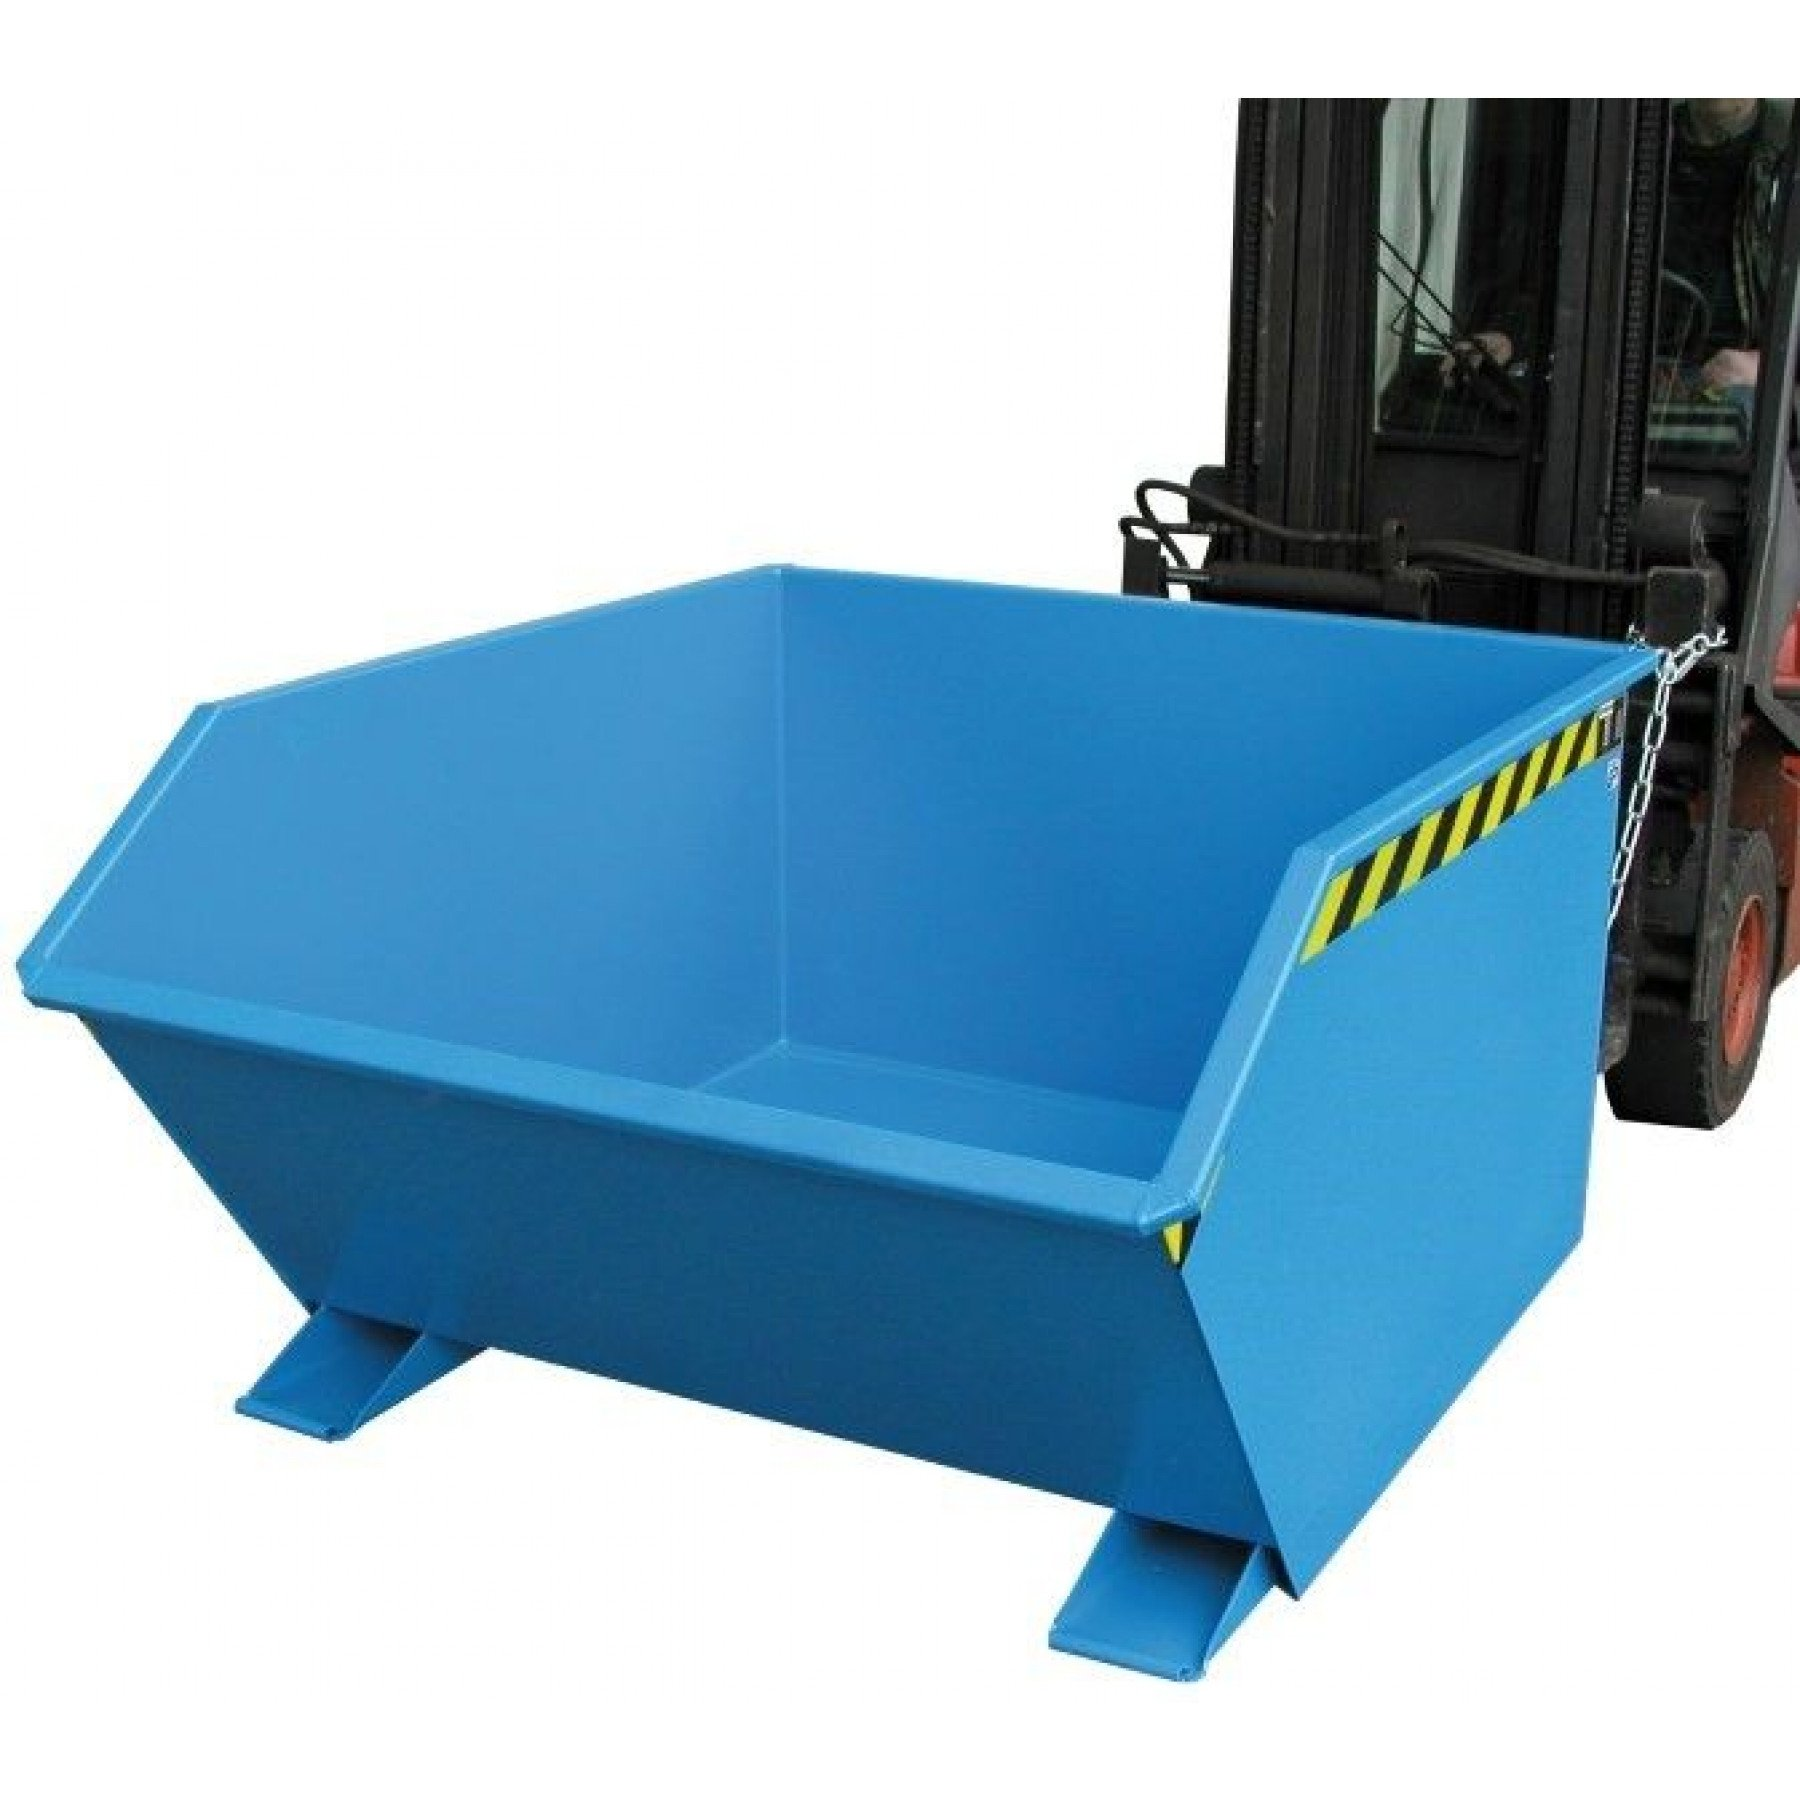 Kiepcontainer laag model, gelakt of verzinkt, type MTFL